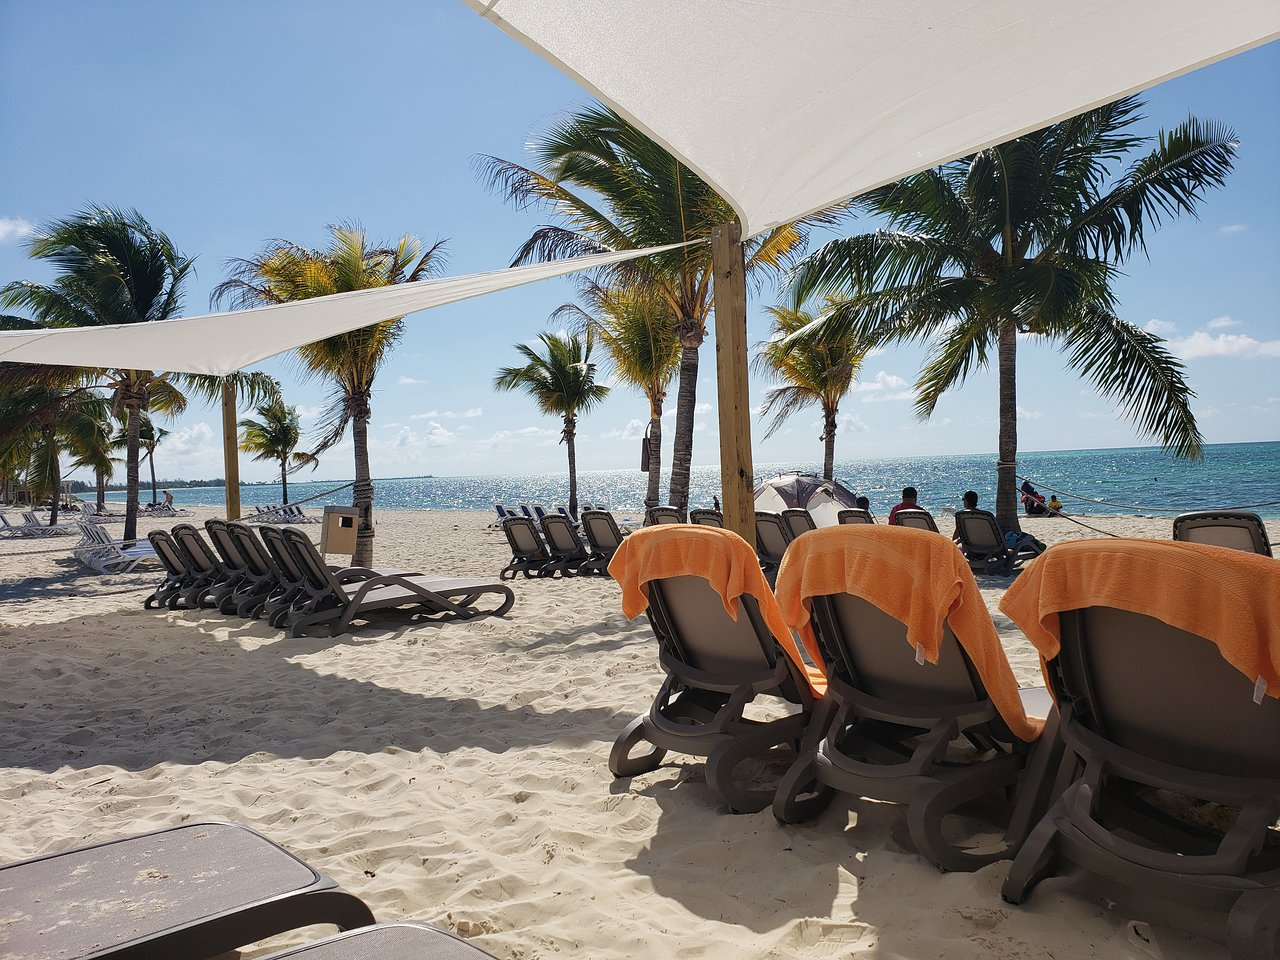 Viva_Wyndham_Fortuna_Beach_Sitting_24561ef6d2.jpg